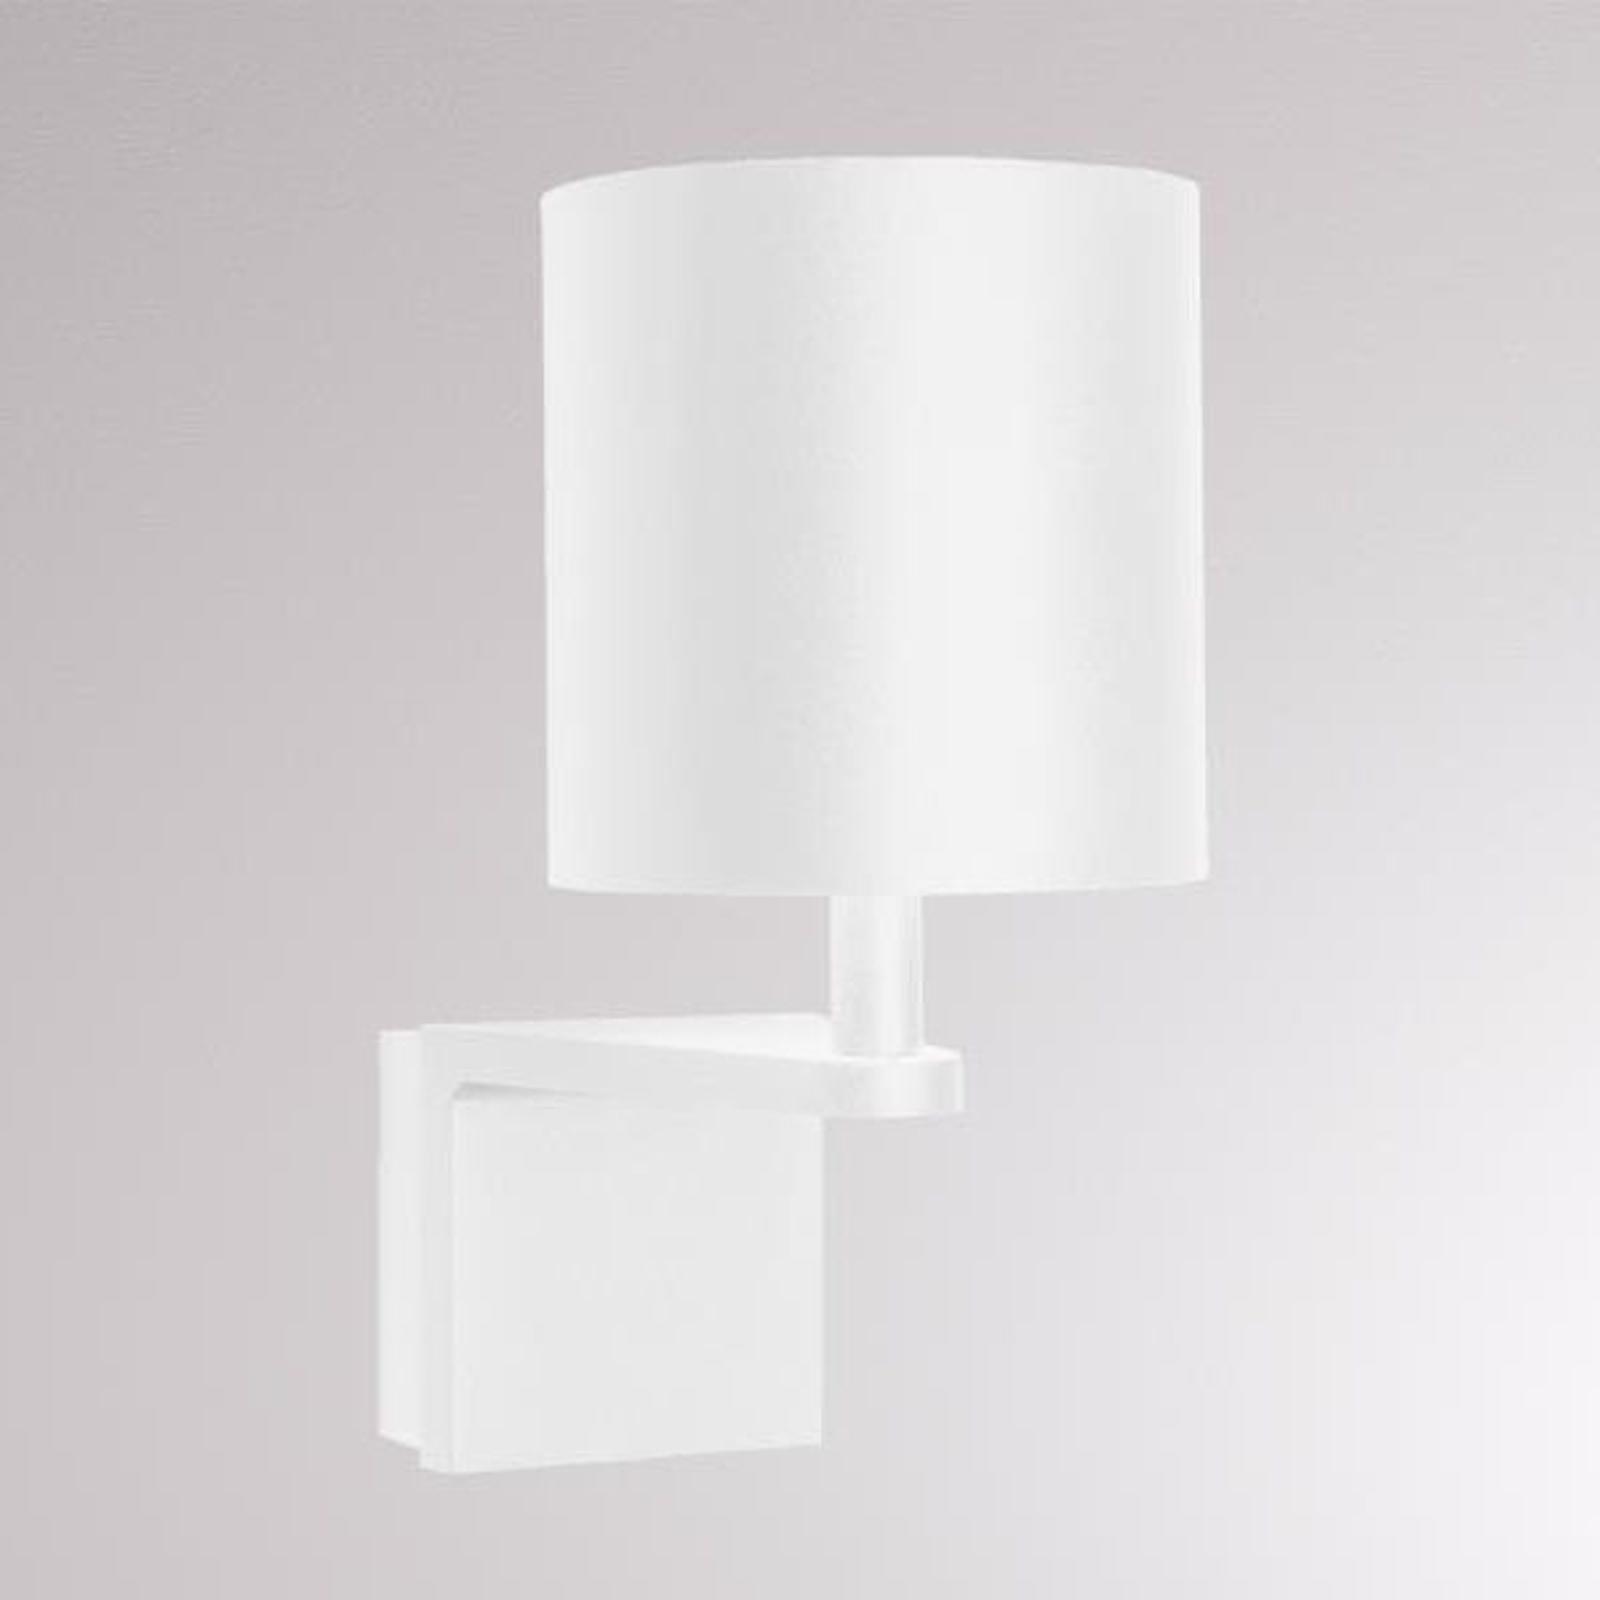 LOUM Waamp LED wandlamp wit